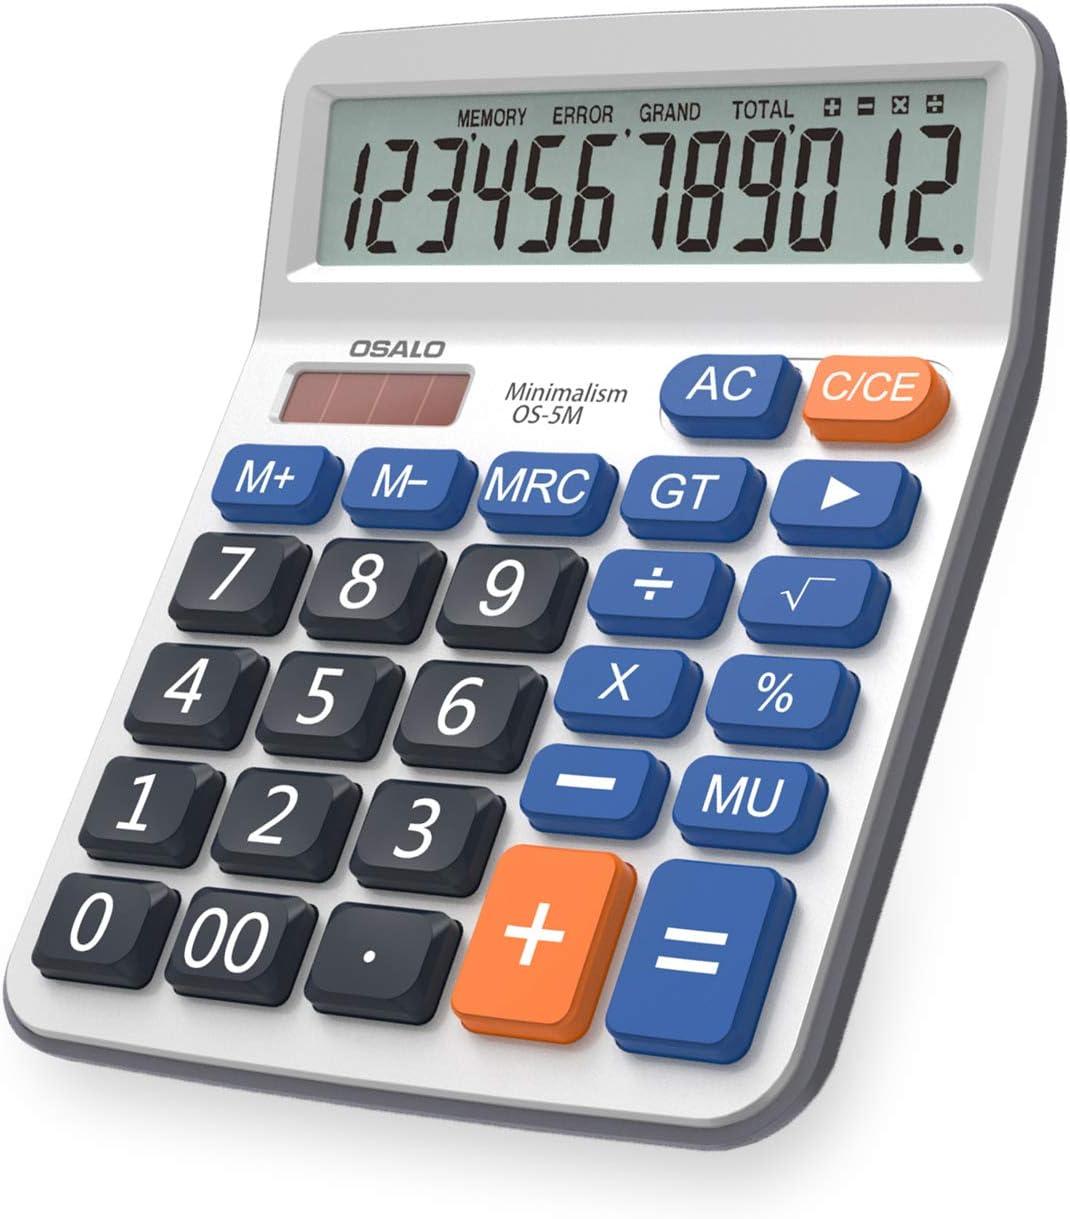 Pendancy Large LCD Display Button Electronic 12 Digits Desktop Minimalist Calculator(5M)